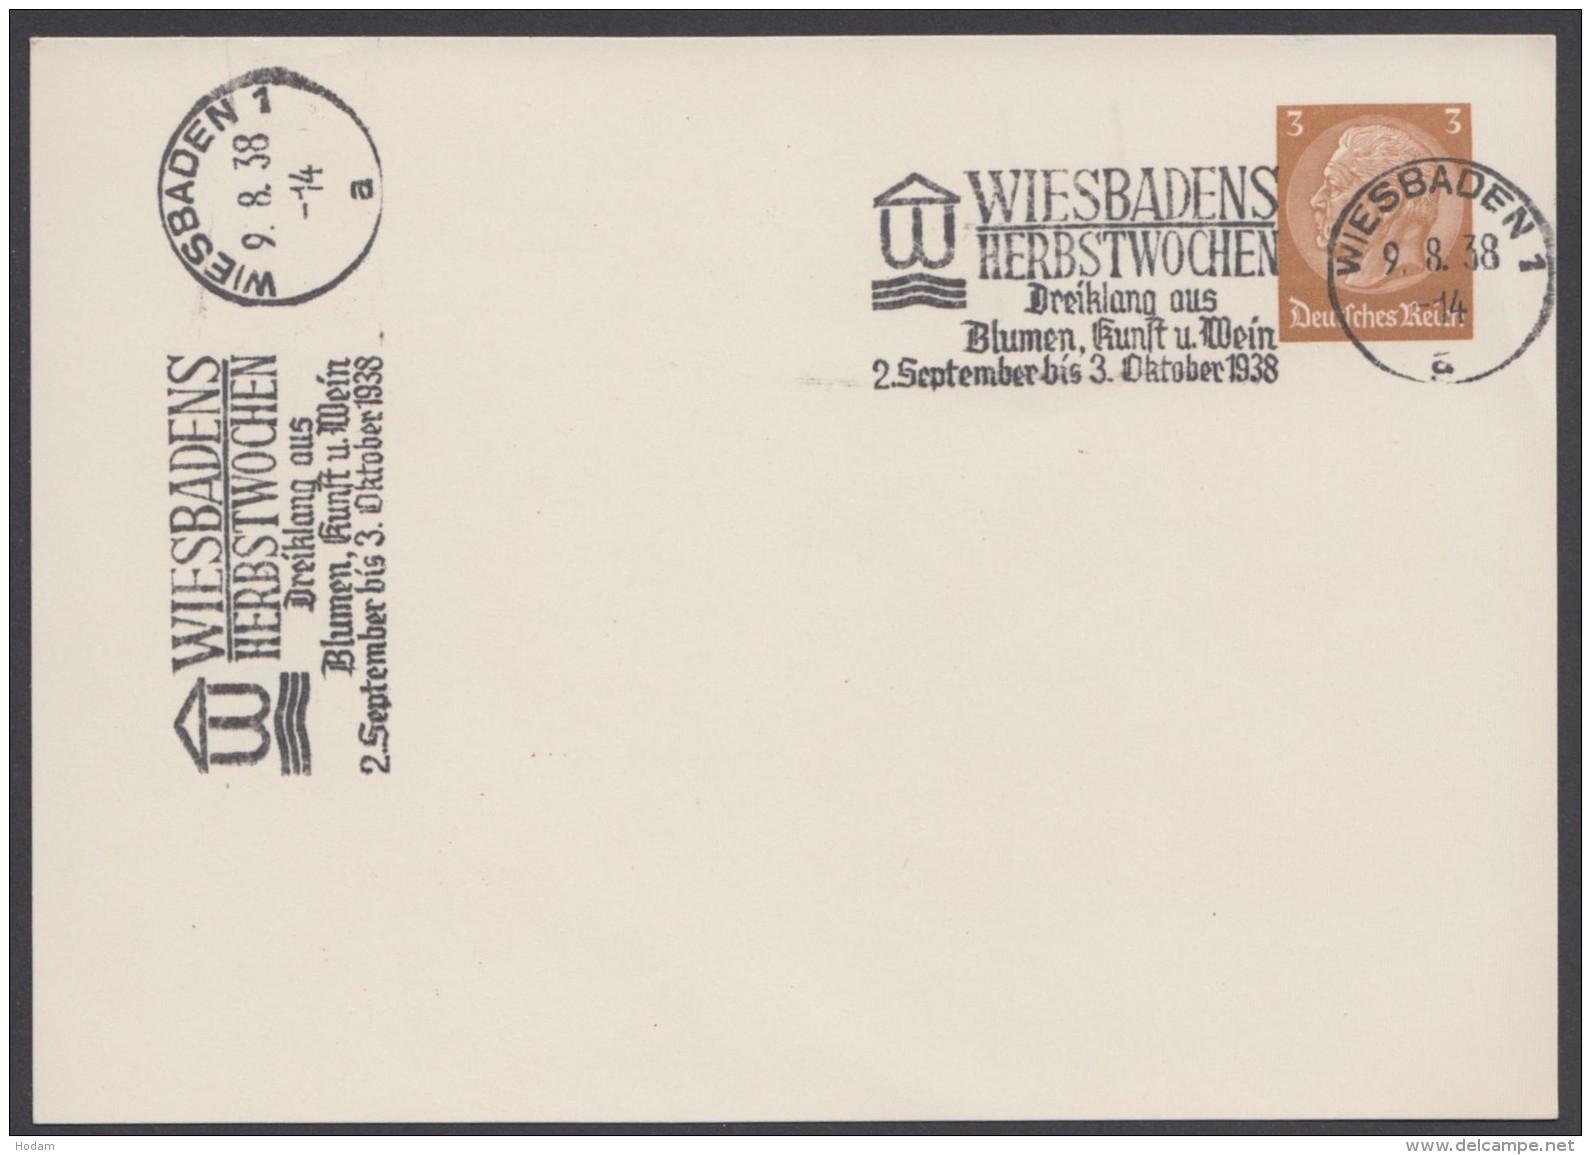 "PP 122 , Propaganda-Stempel ""Wiesbaden"", Herbstwochen"", 9.8.38 - Briefe U. Dokumente"